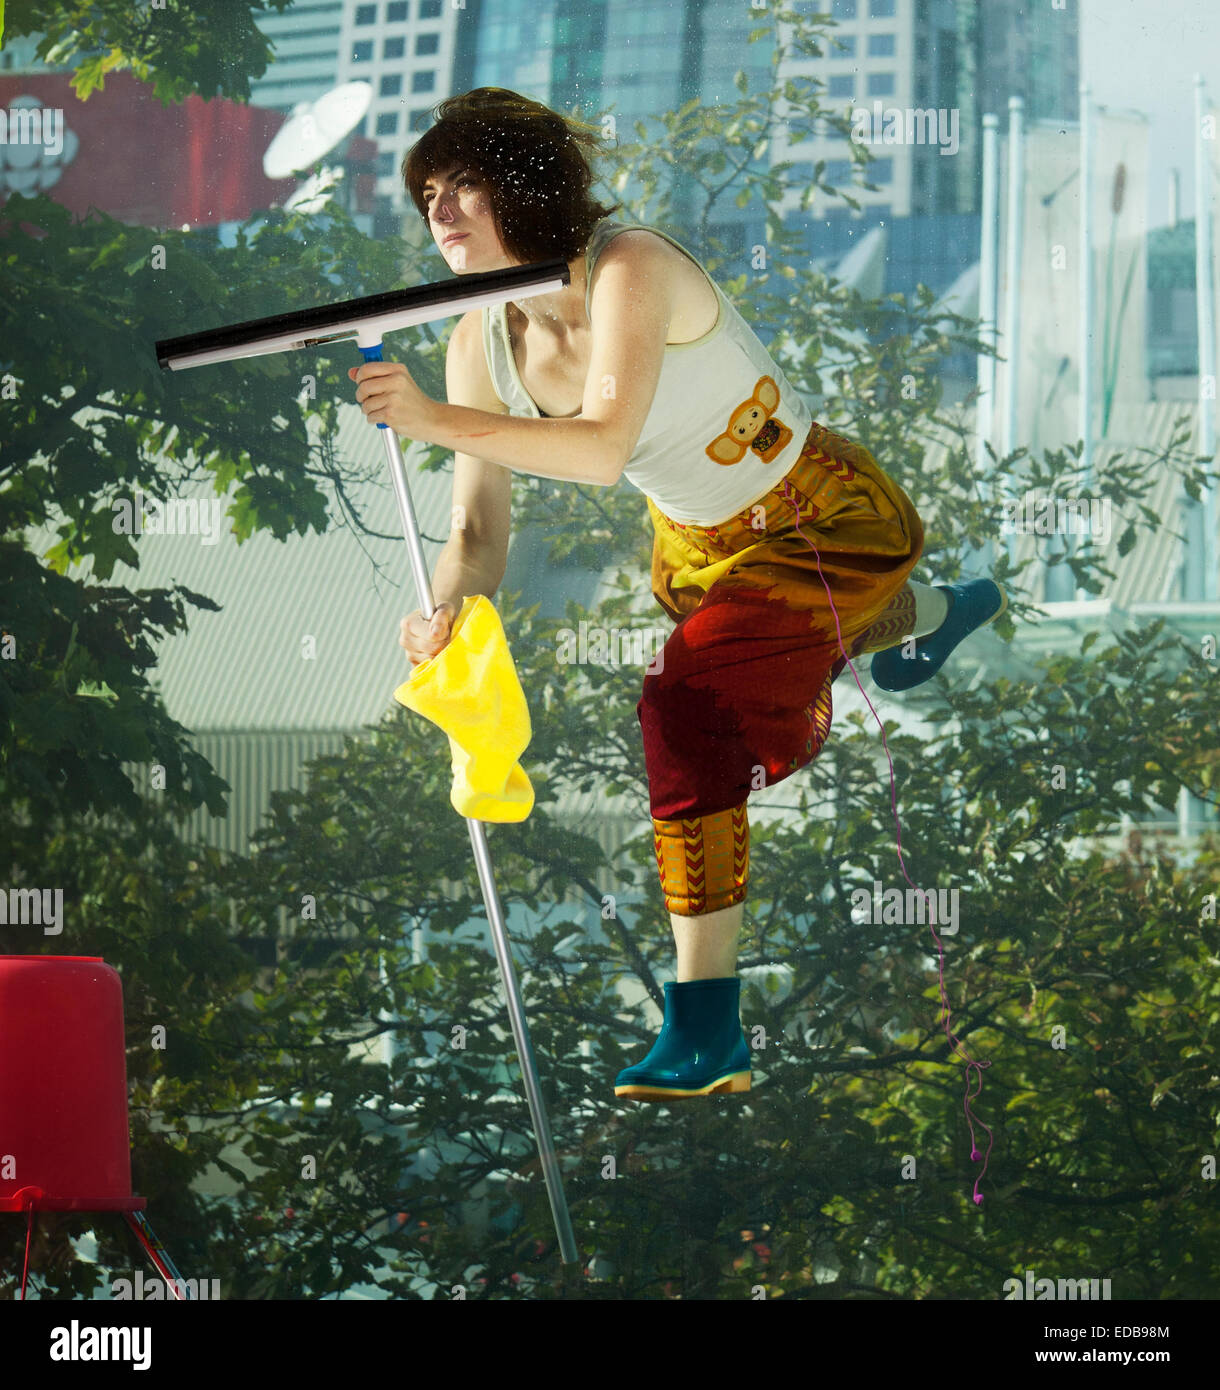 Street performance. Girl washing windows underwater in glass tank, Toronto, Canada - Stock Image